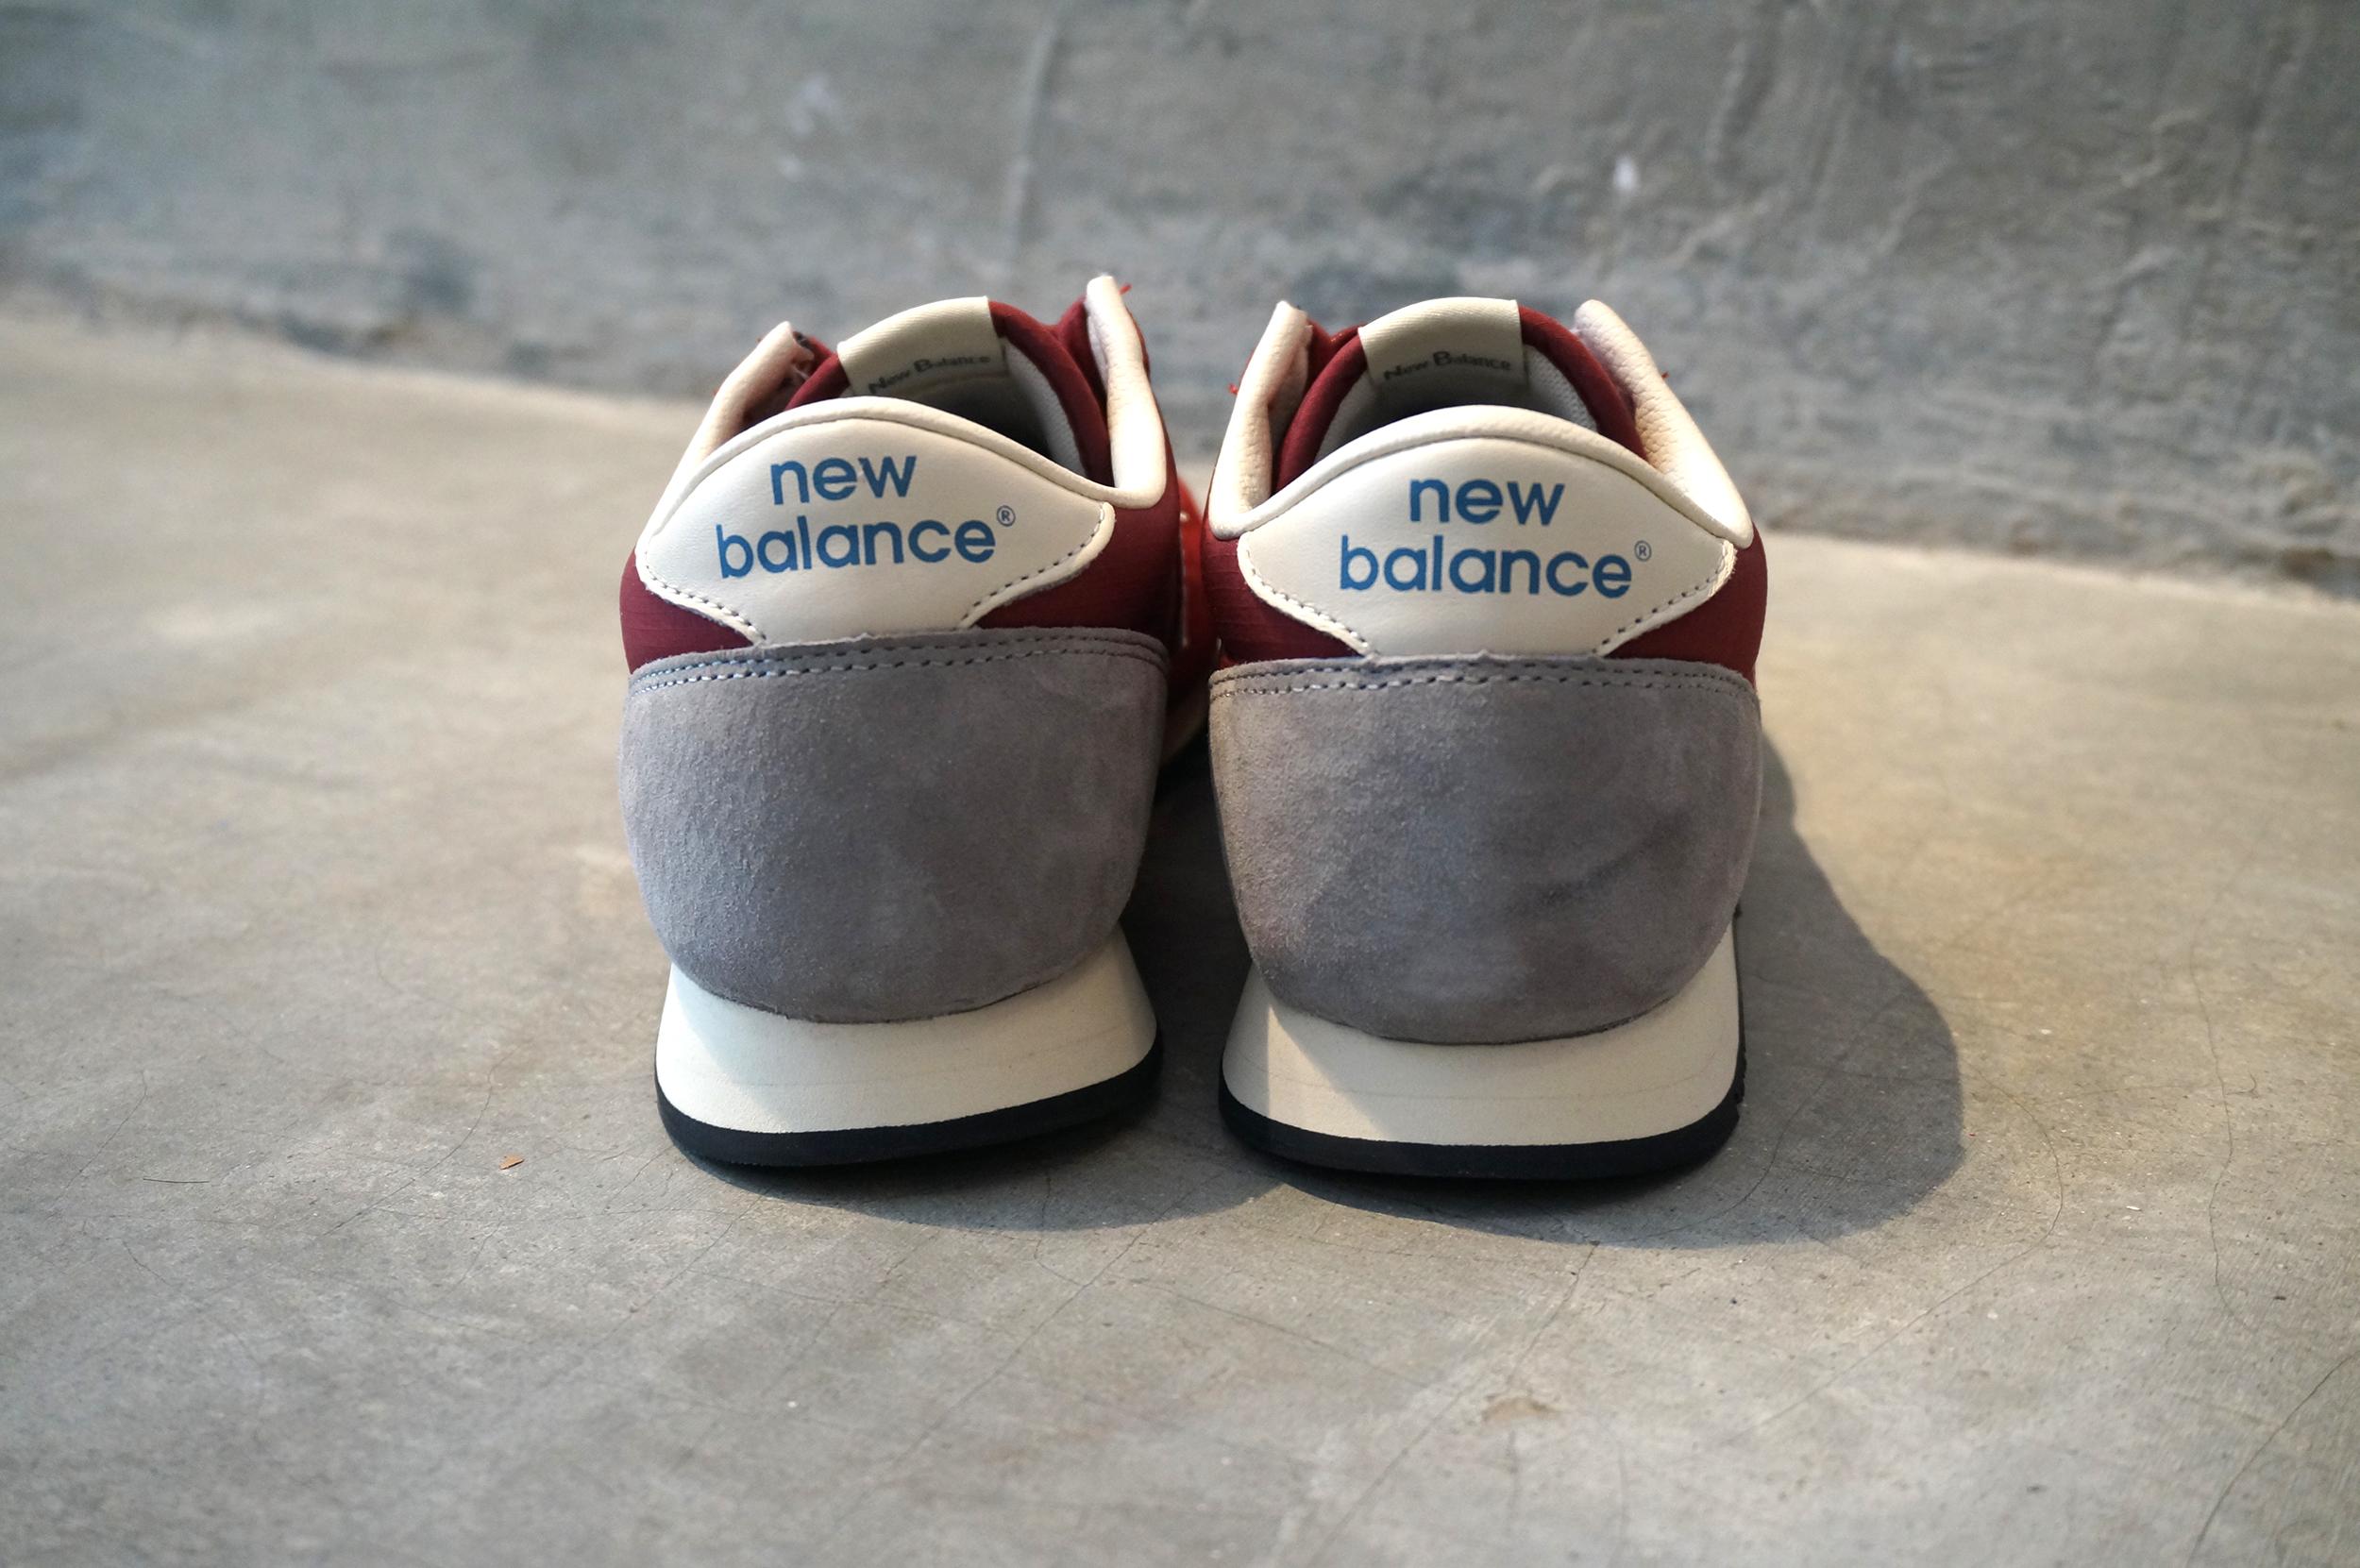 comprar new balance 420 granate mujer